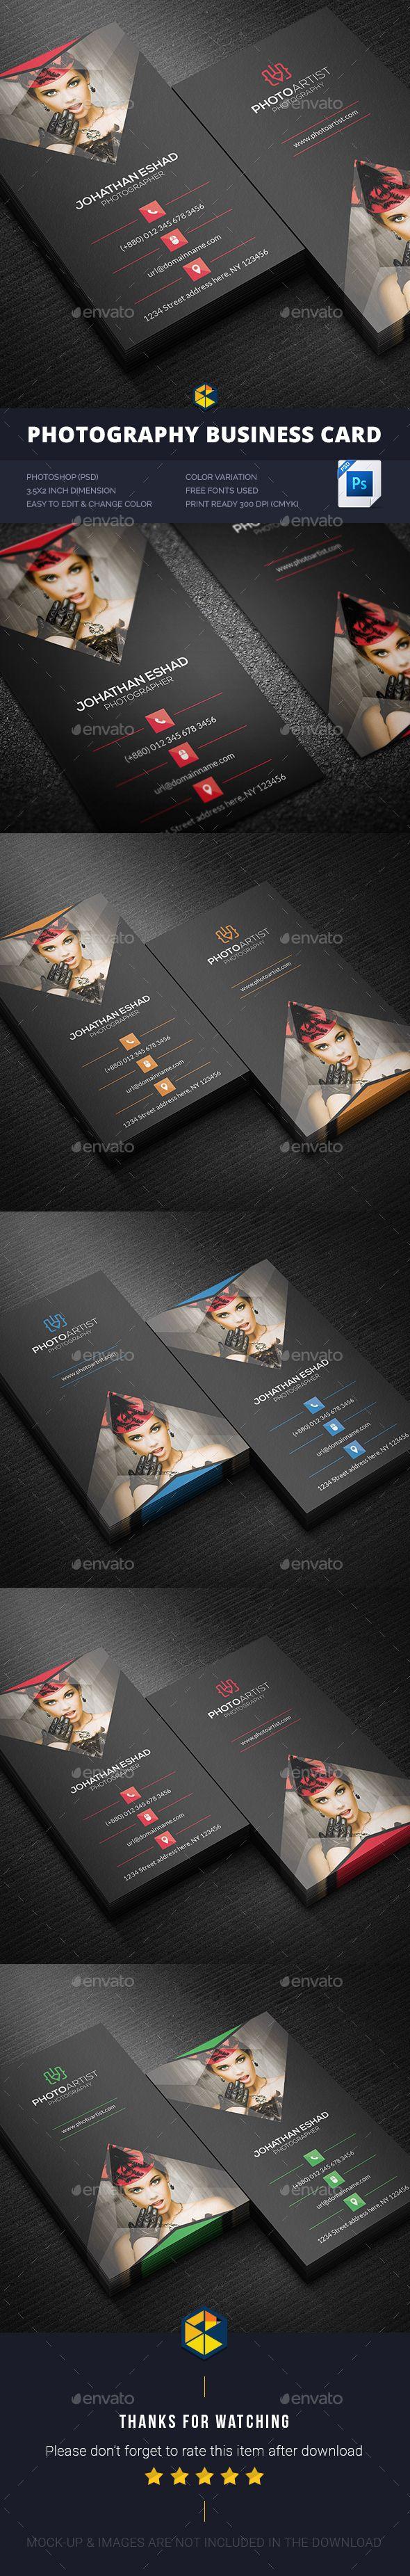 De 379 bsta wizytowki bilderna p pinterest photography business card design template business cards print template psd download here https accmission Choice Image